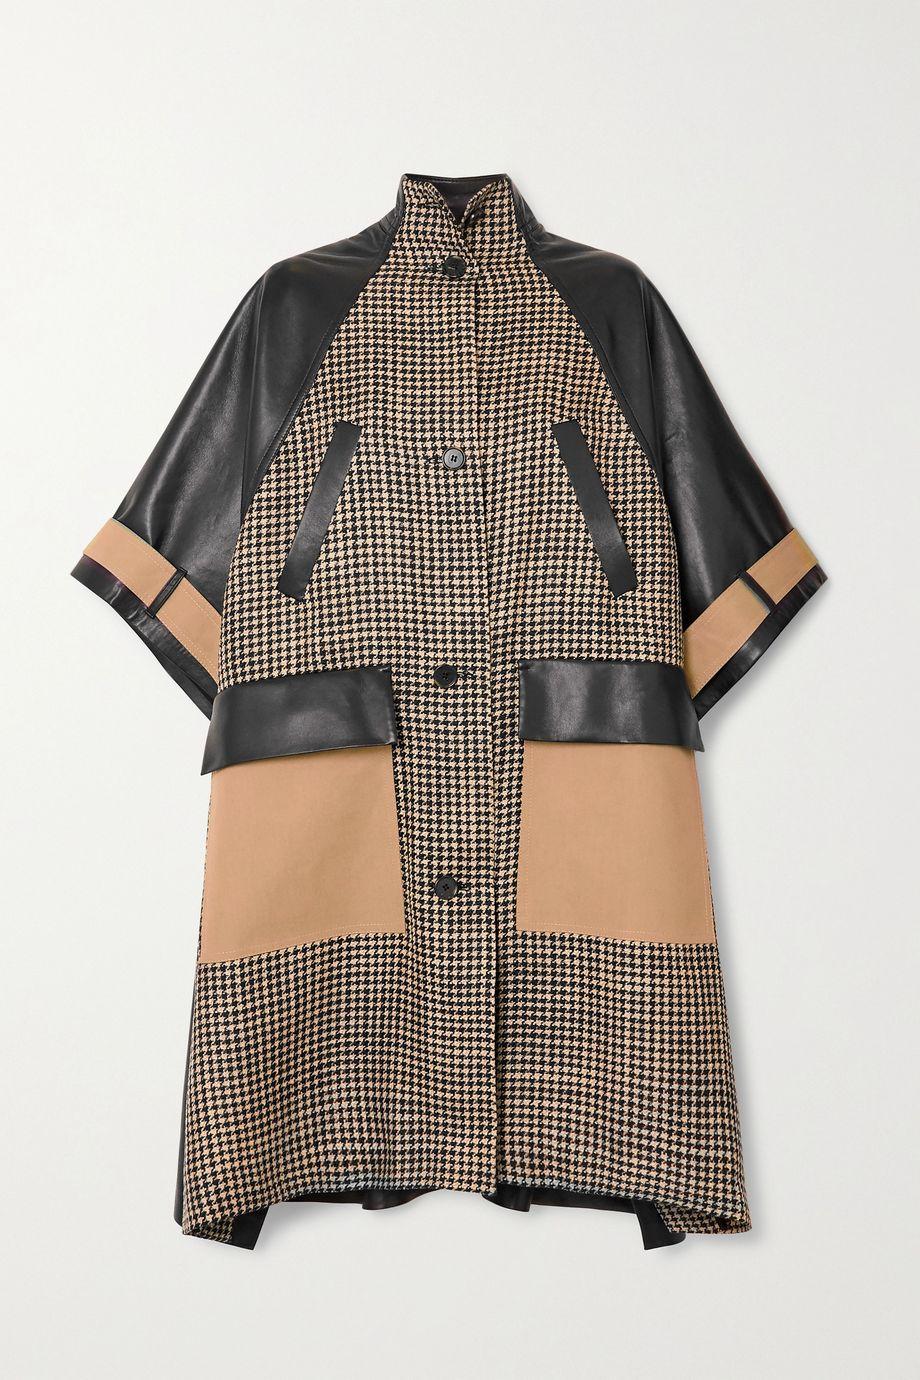 Nanushka Nyree houndstooth tweed, gabardine and leather coat